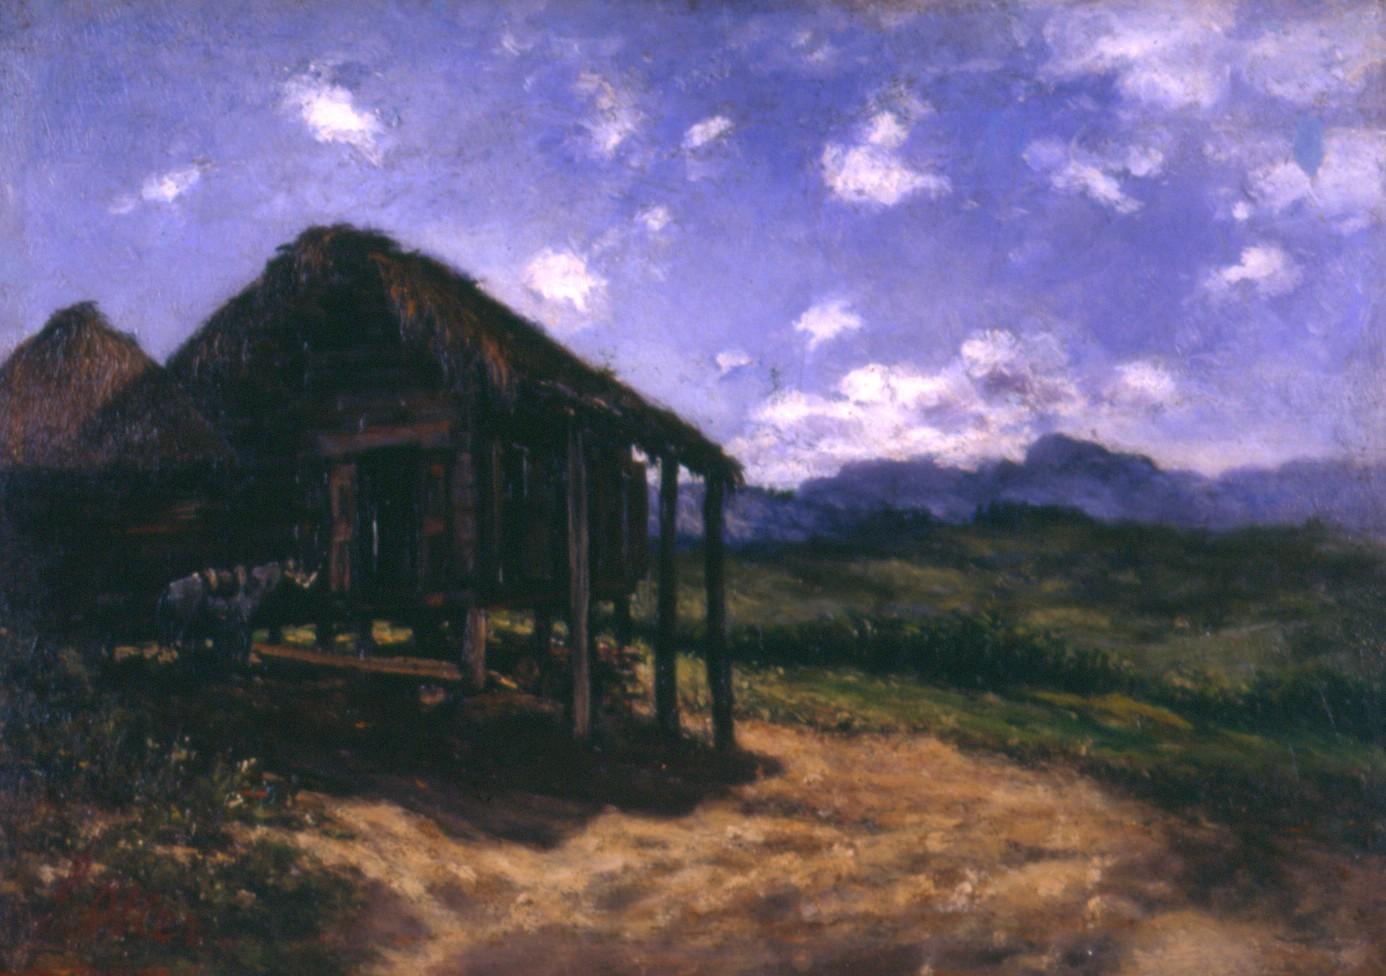 Landscape with hut